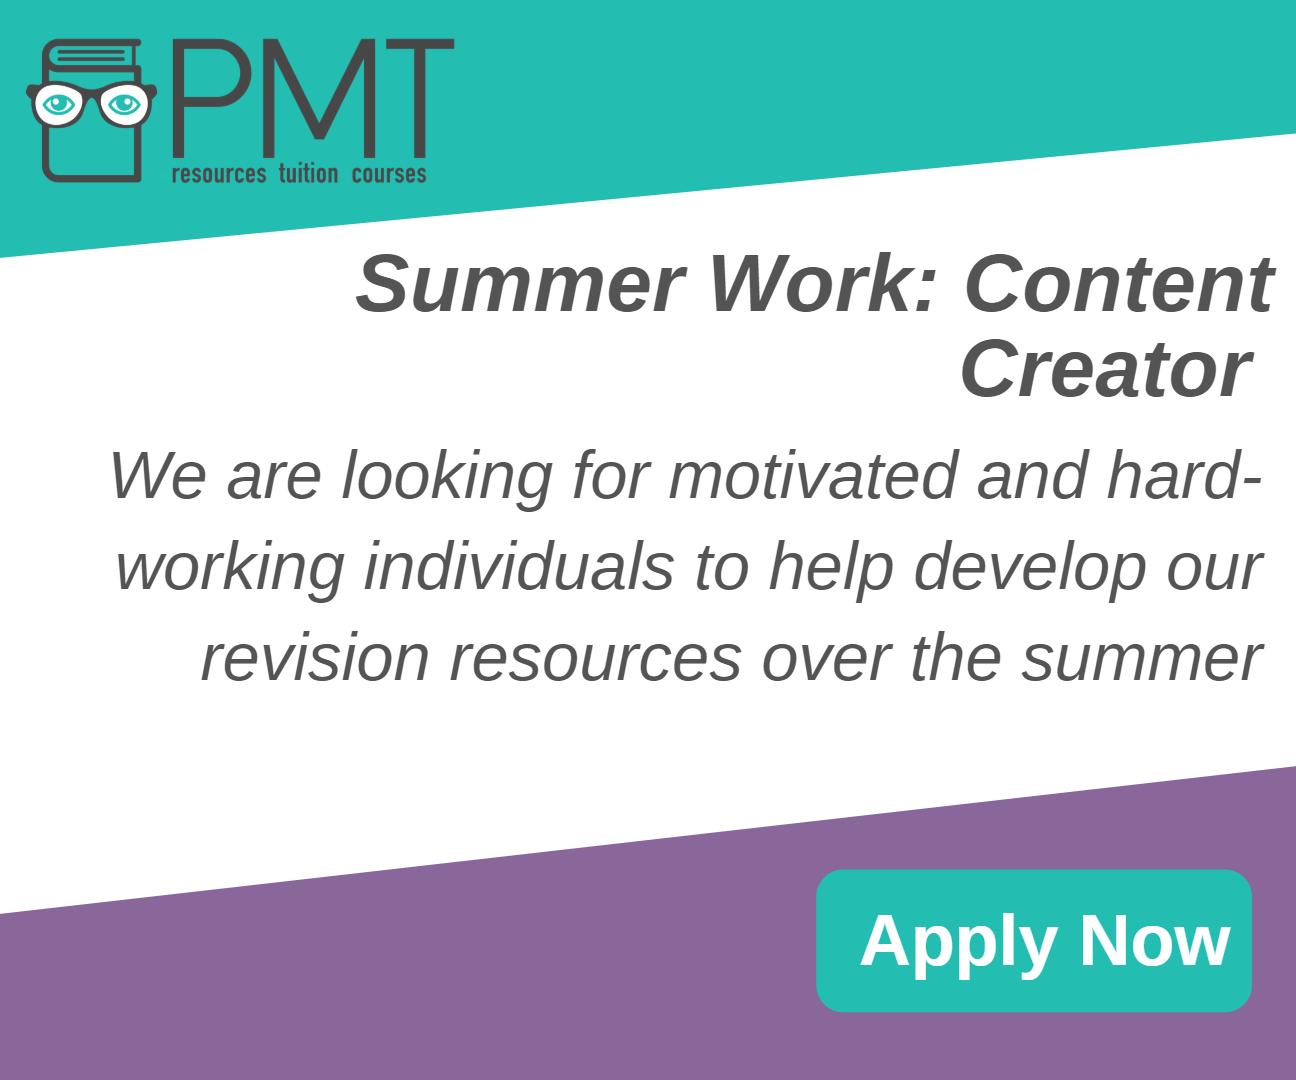 Summer Work at PMT Education